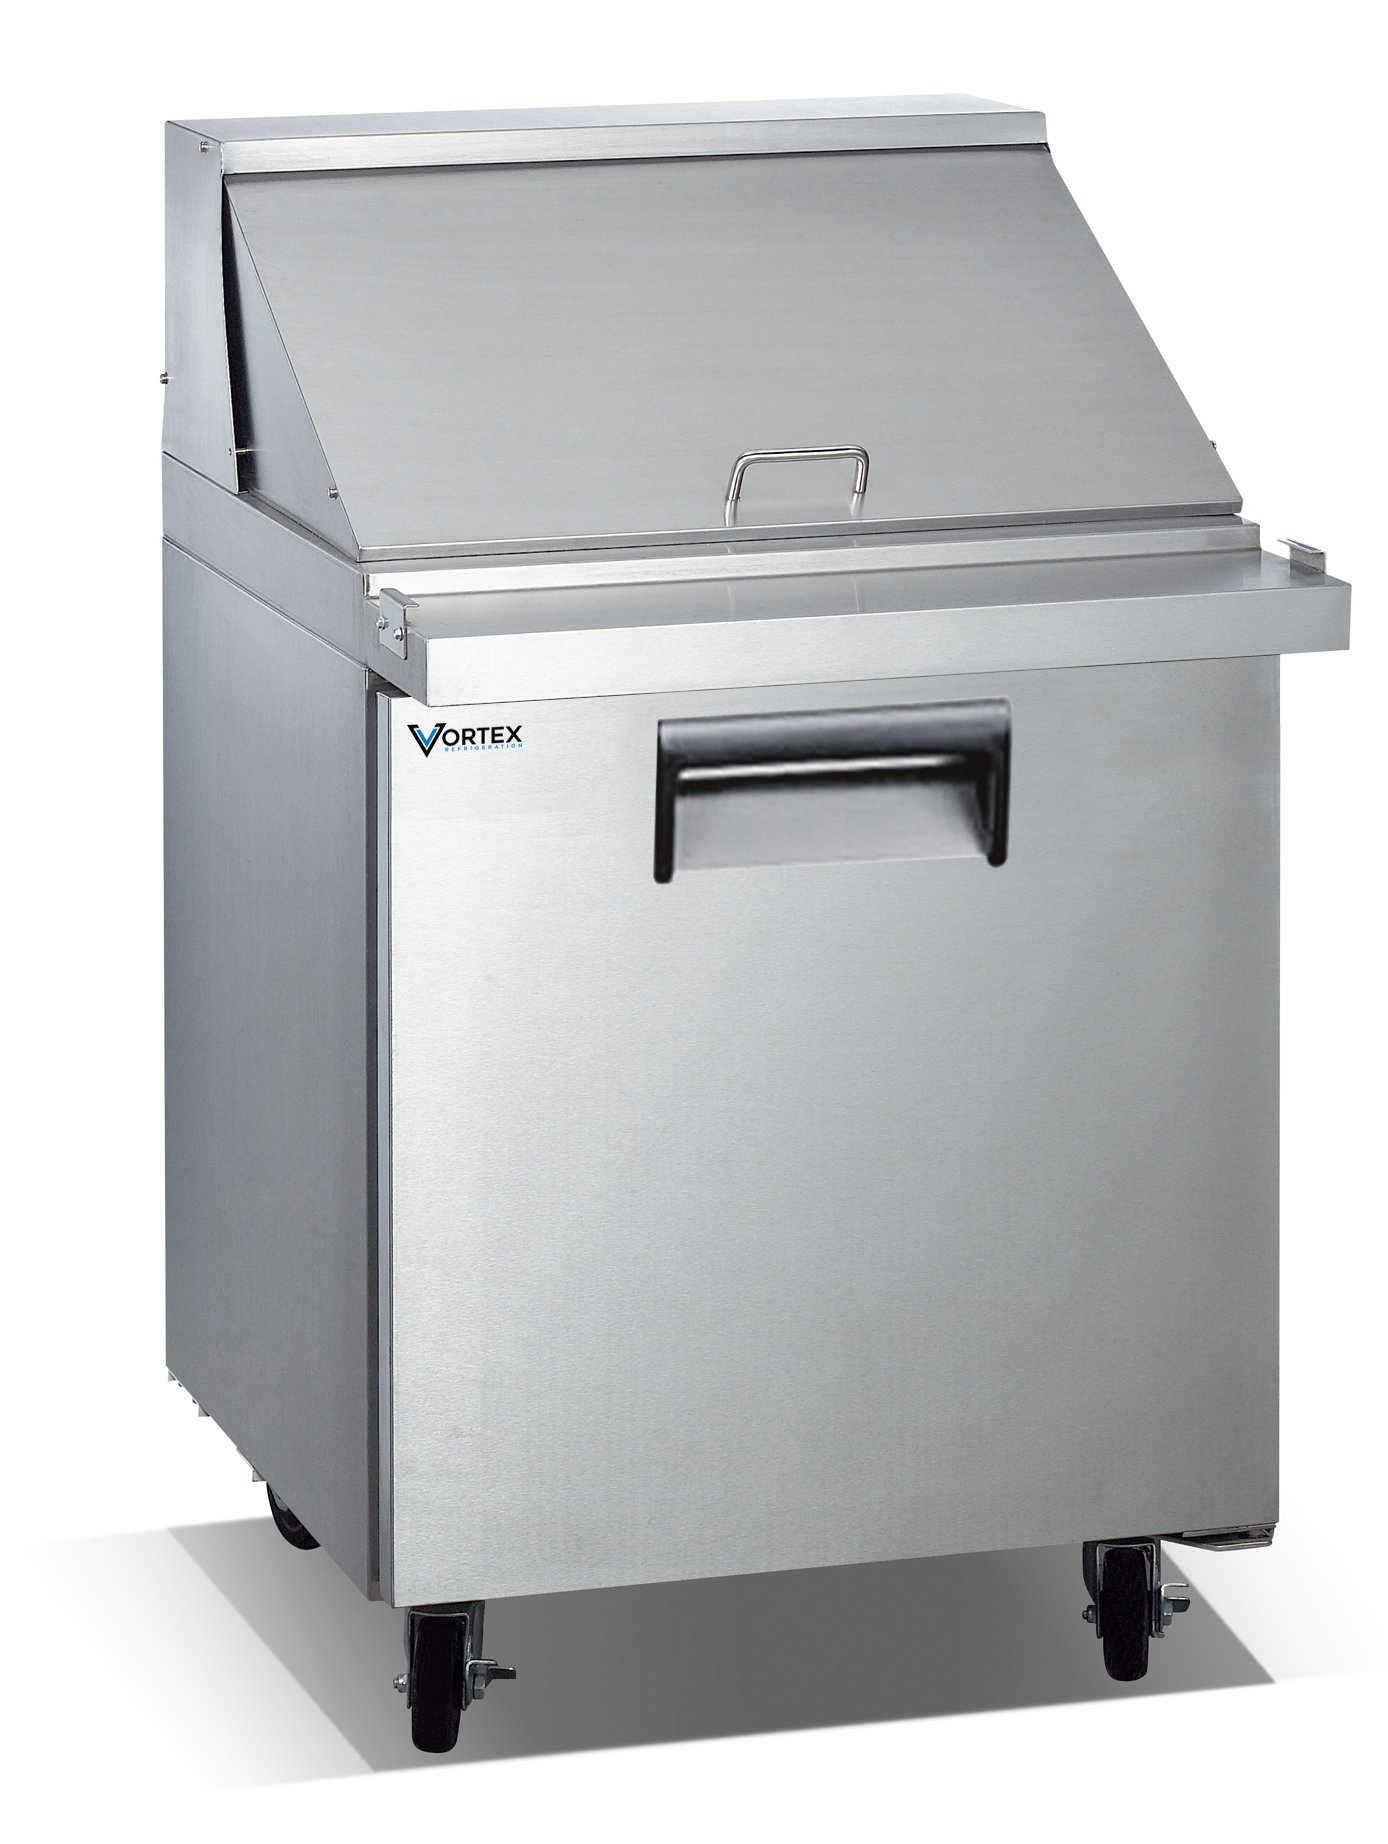 Vortex Refrigeration Commercial 1 Door 27'', 12 Pan Mega Top Sandwich Prep Table - 7 Cu. Ft.